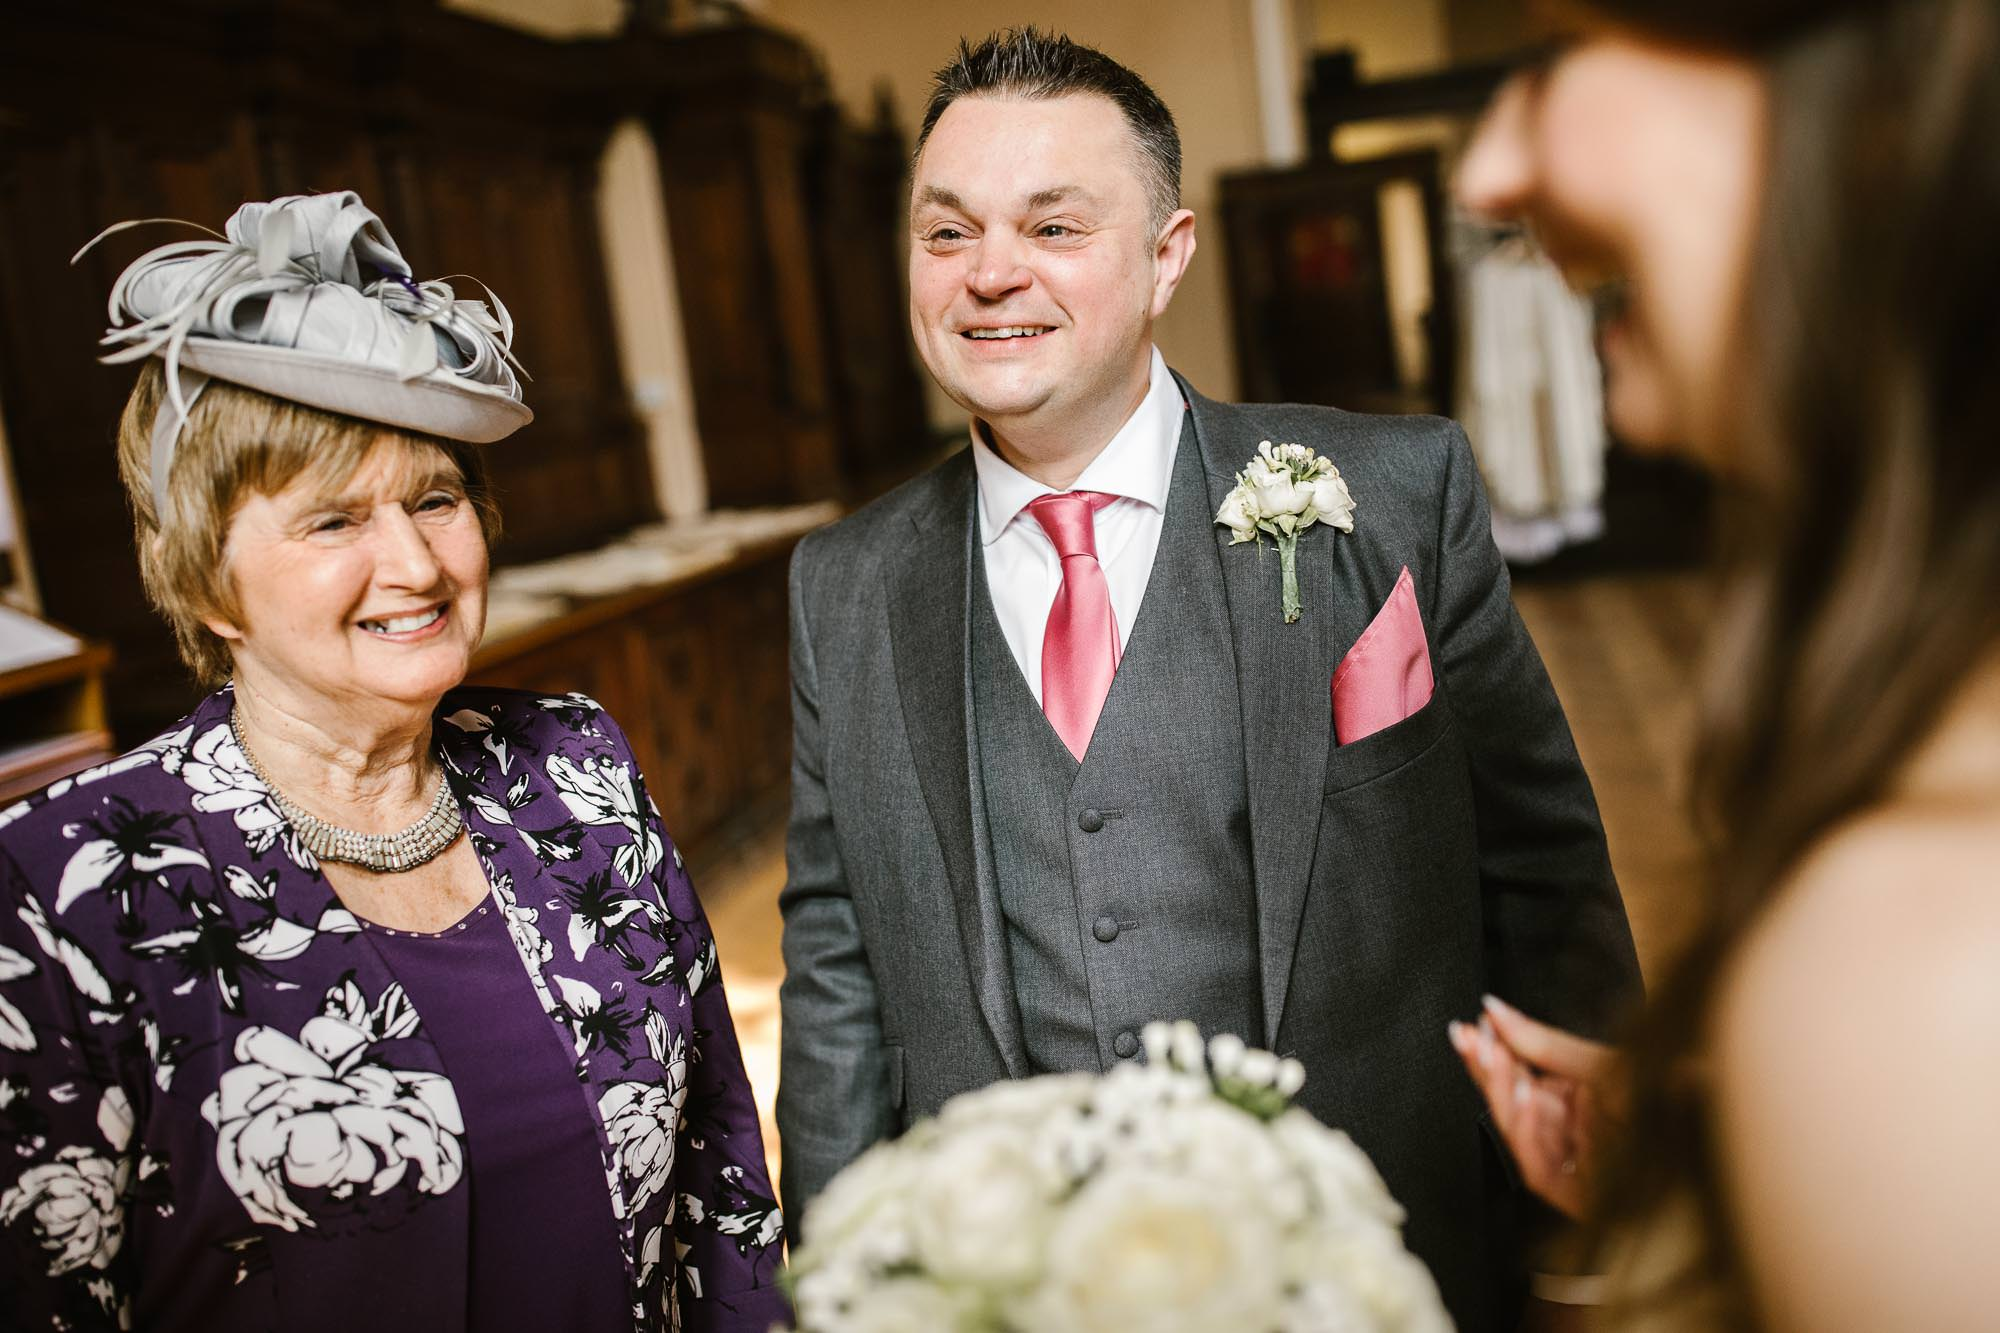 The Amadeus Wedding Photography - David and Lizzie 27